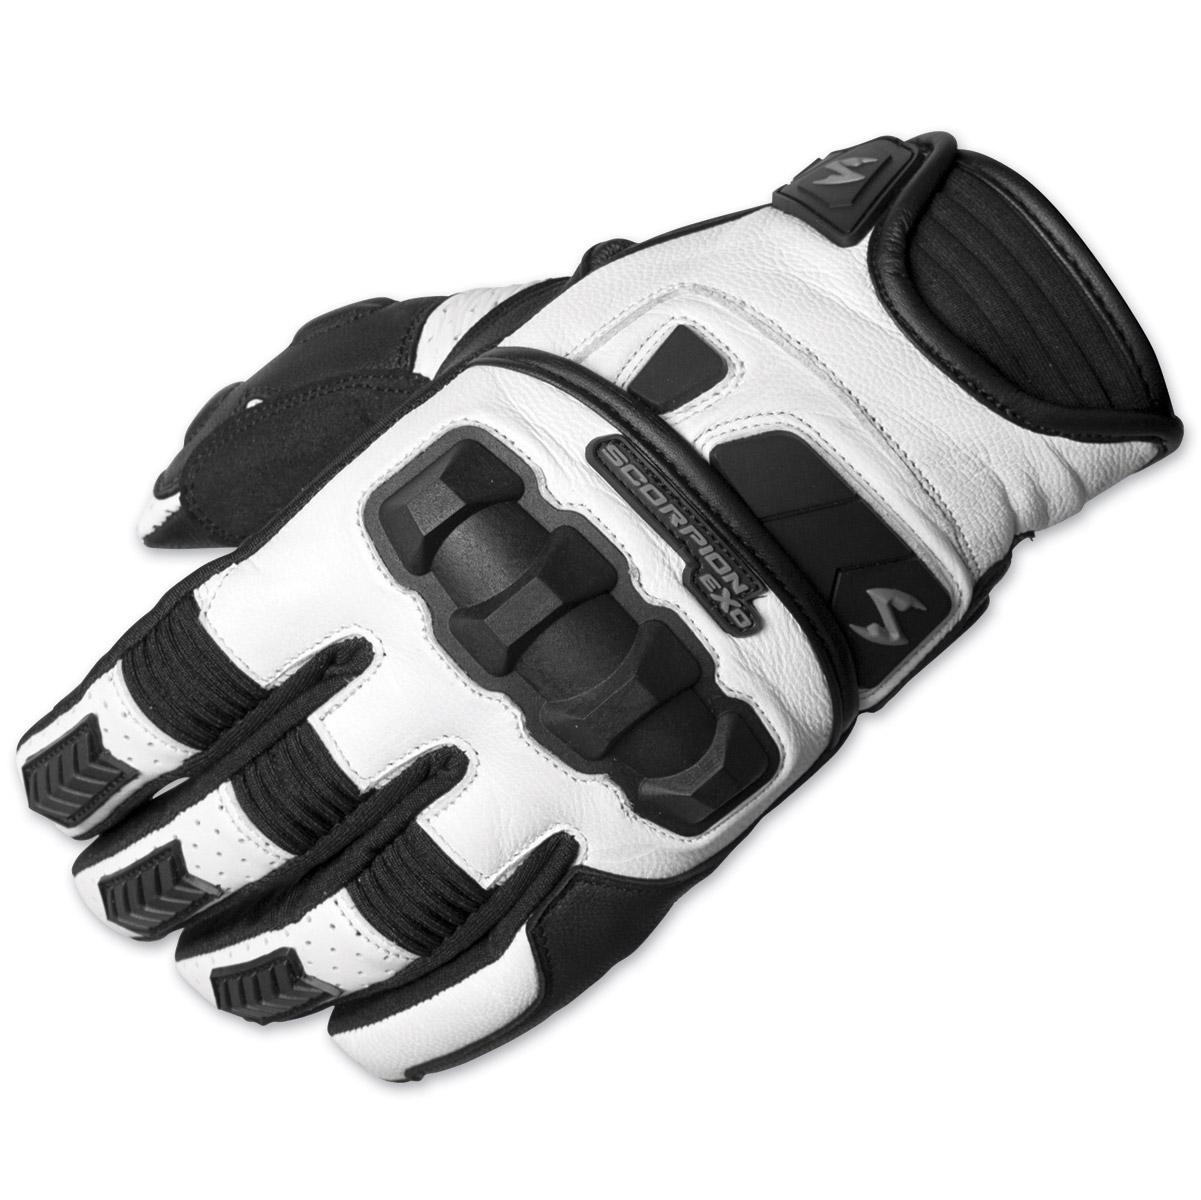 Scorpion EXO Men's Klaw II White Gloves